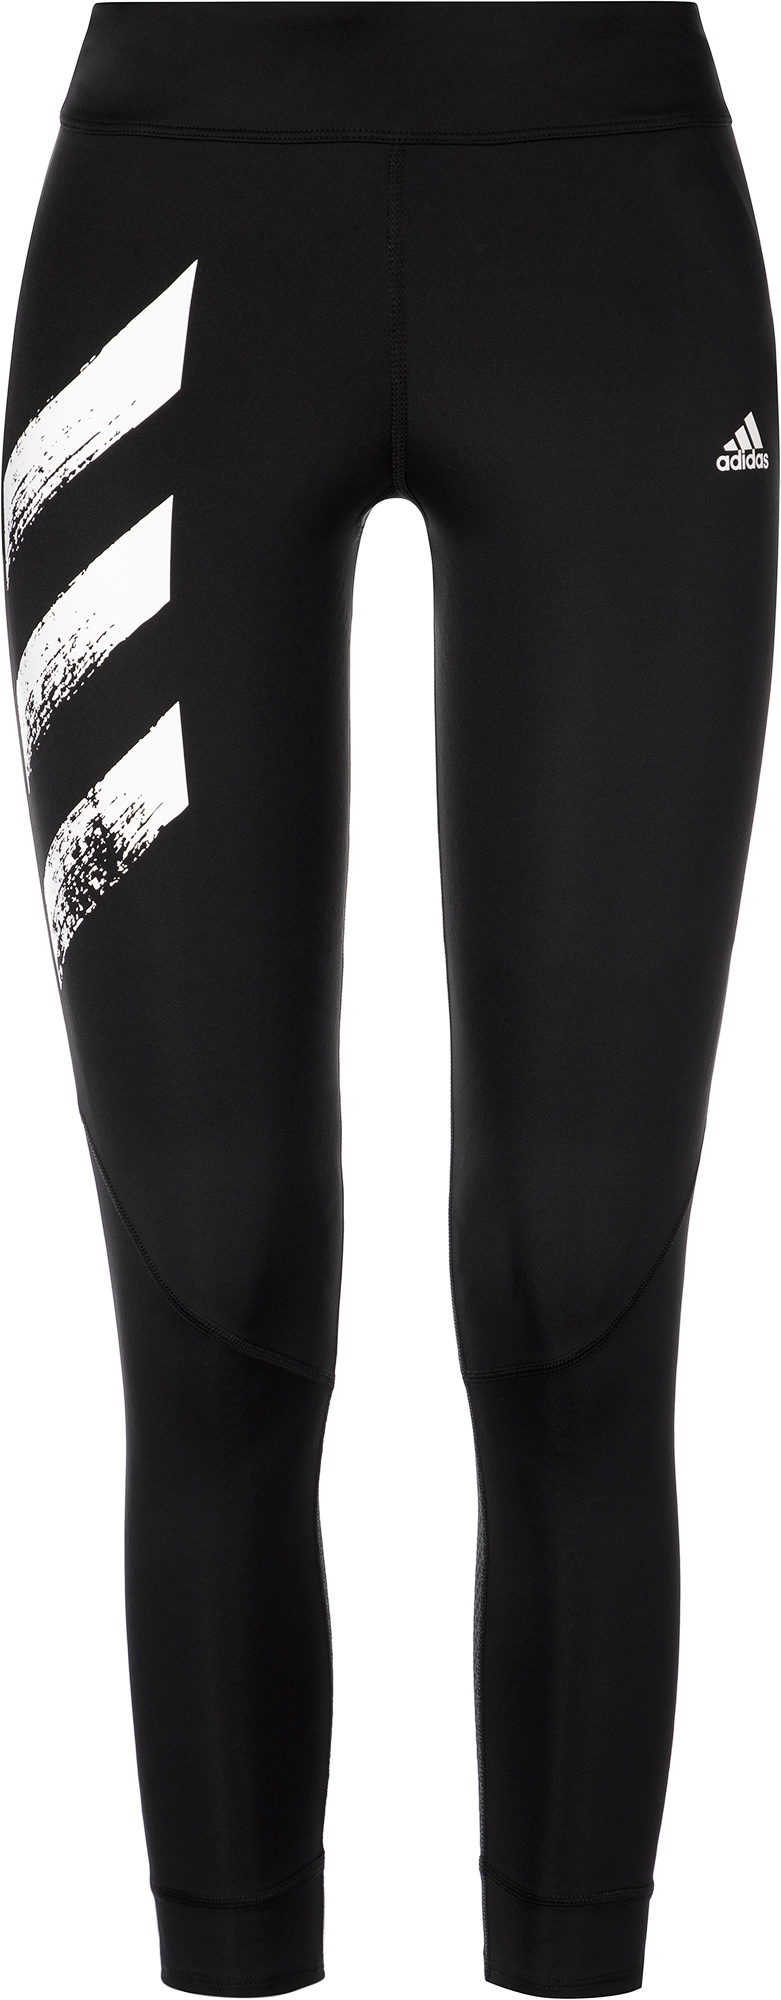 Adidas Легинсы женские adidas Own The Run 3-Stripes Fast, размер 46-48 adidas легинсы для девочек adidas essentials 3 stripes размер 128